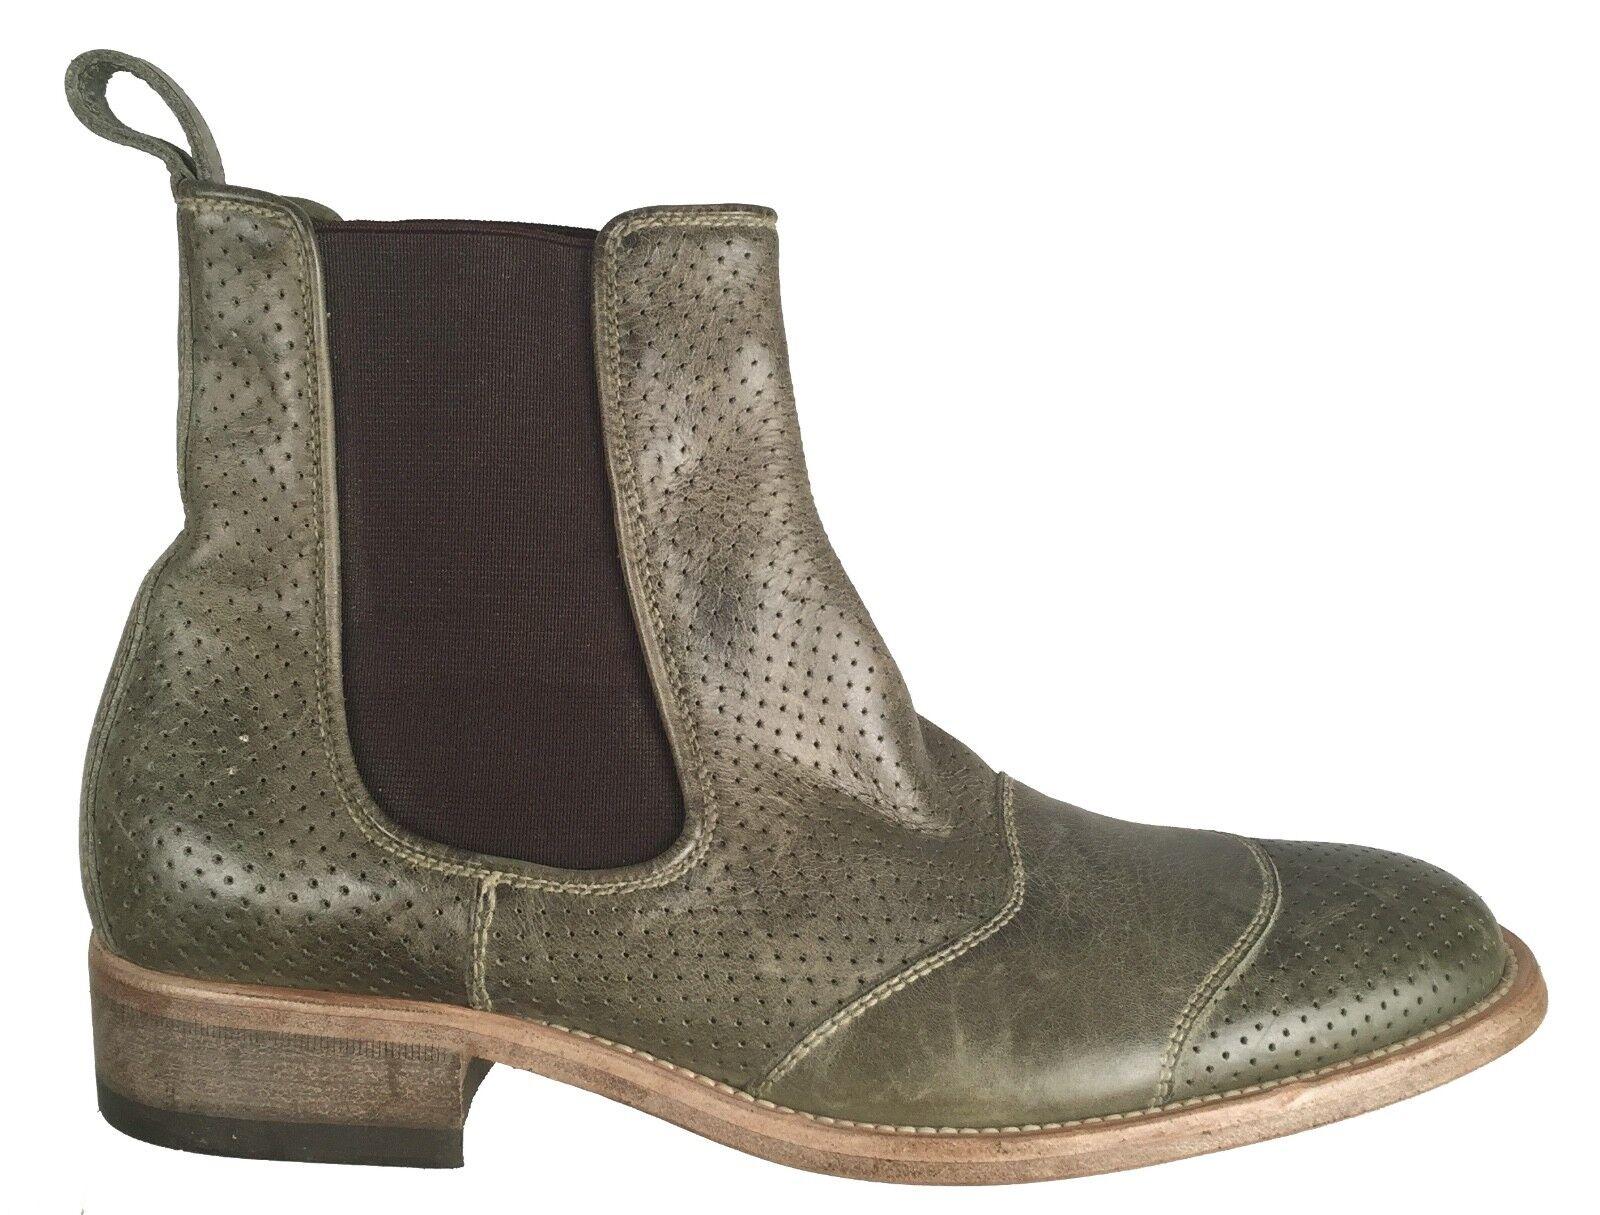 Belstaff para hombre Clásico Tourmaster Tobillo botas De Cuero Perforado Zapatos EU